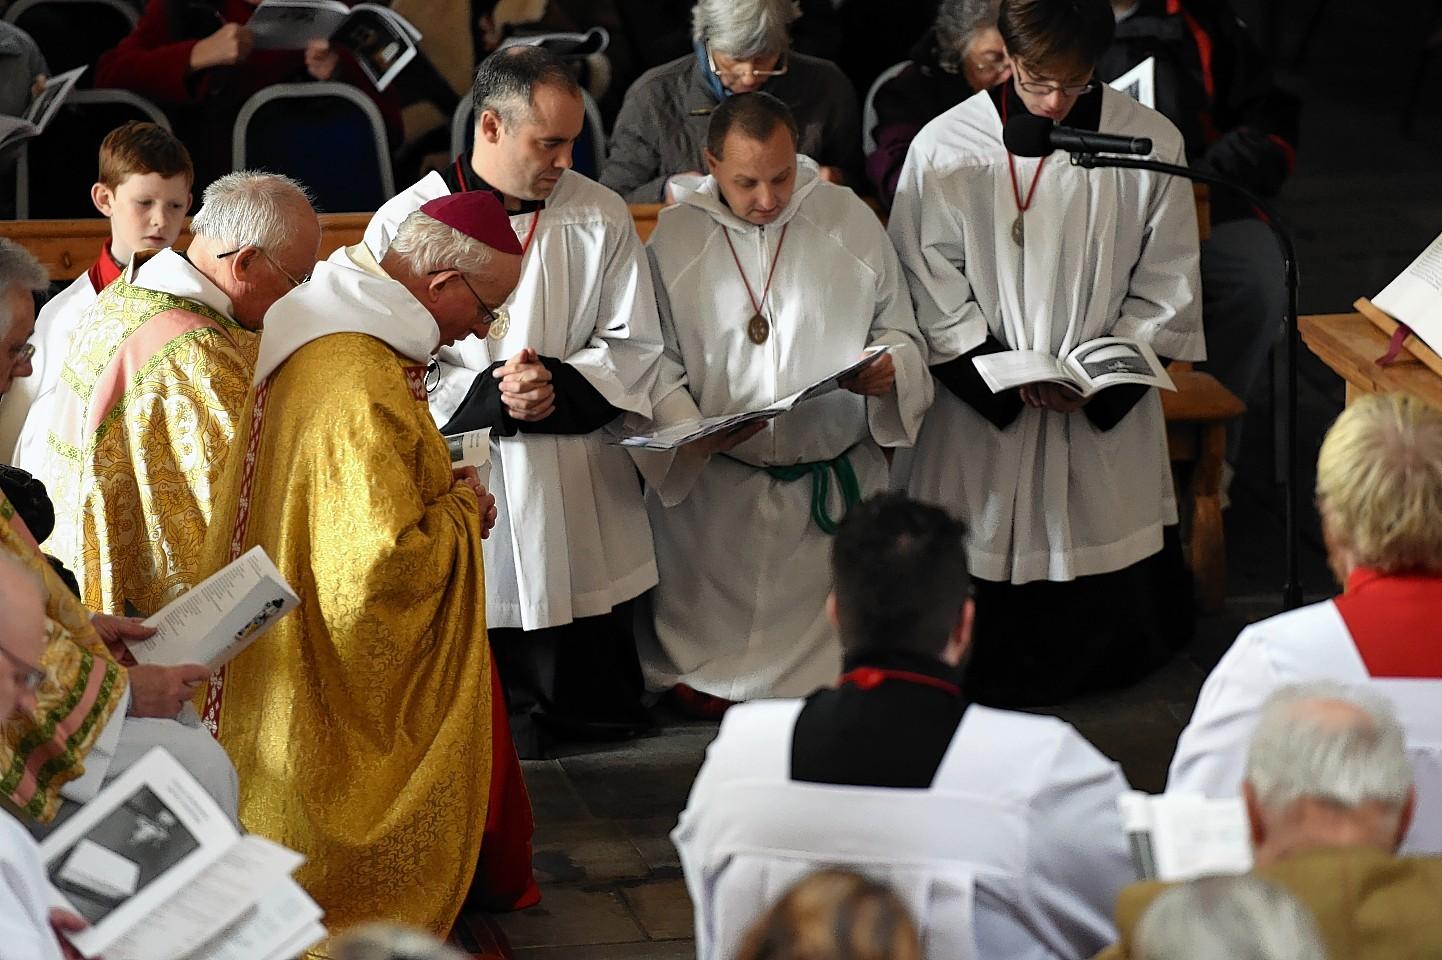 Re-Dedication of Pluscarden Abbey. Picture by Gordon Lennox 05/11/2015